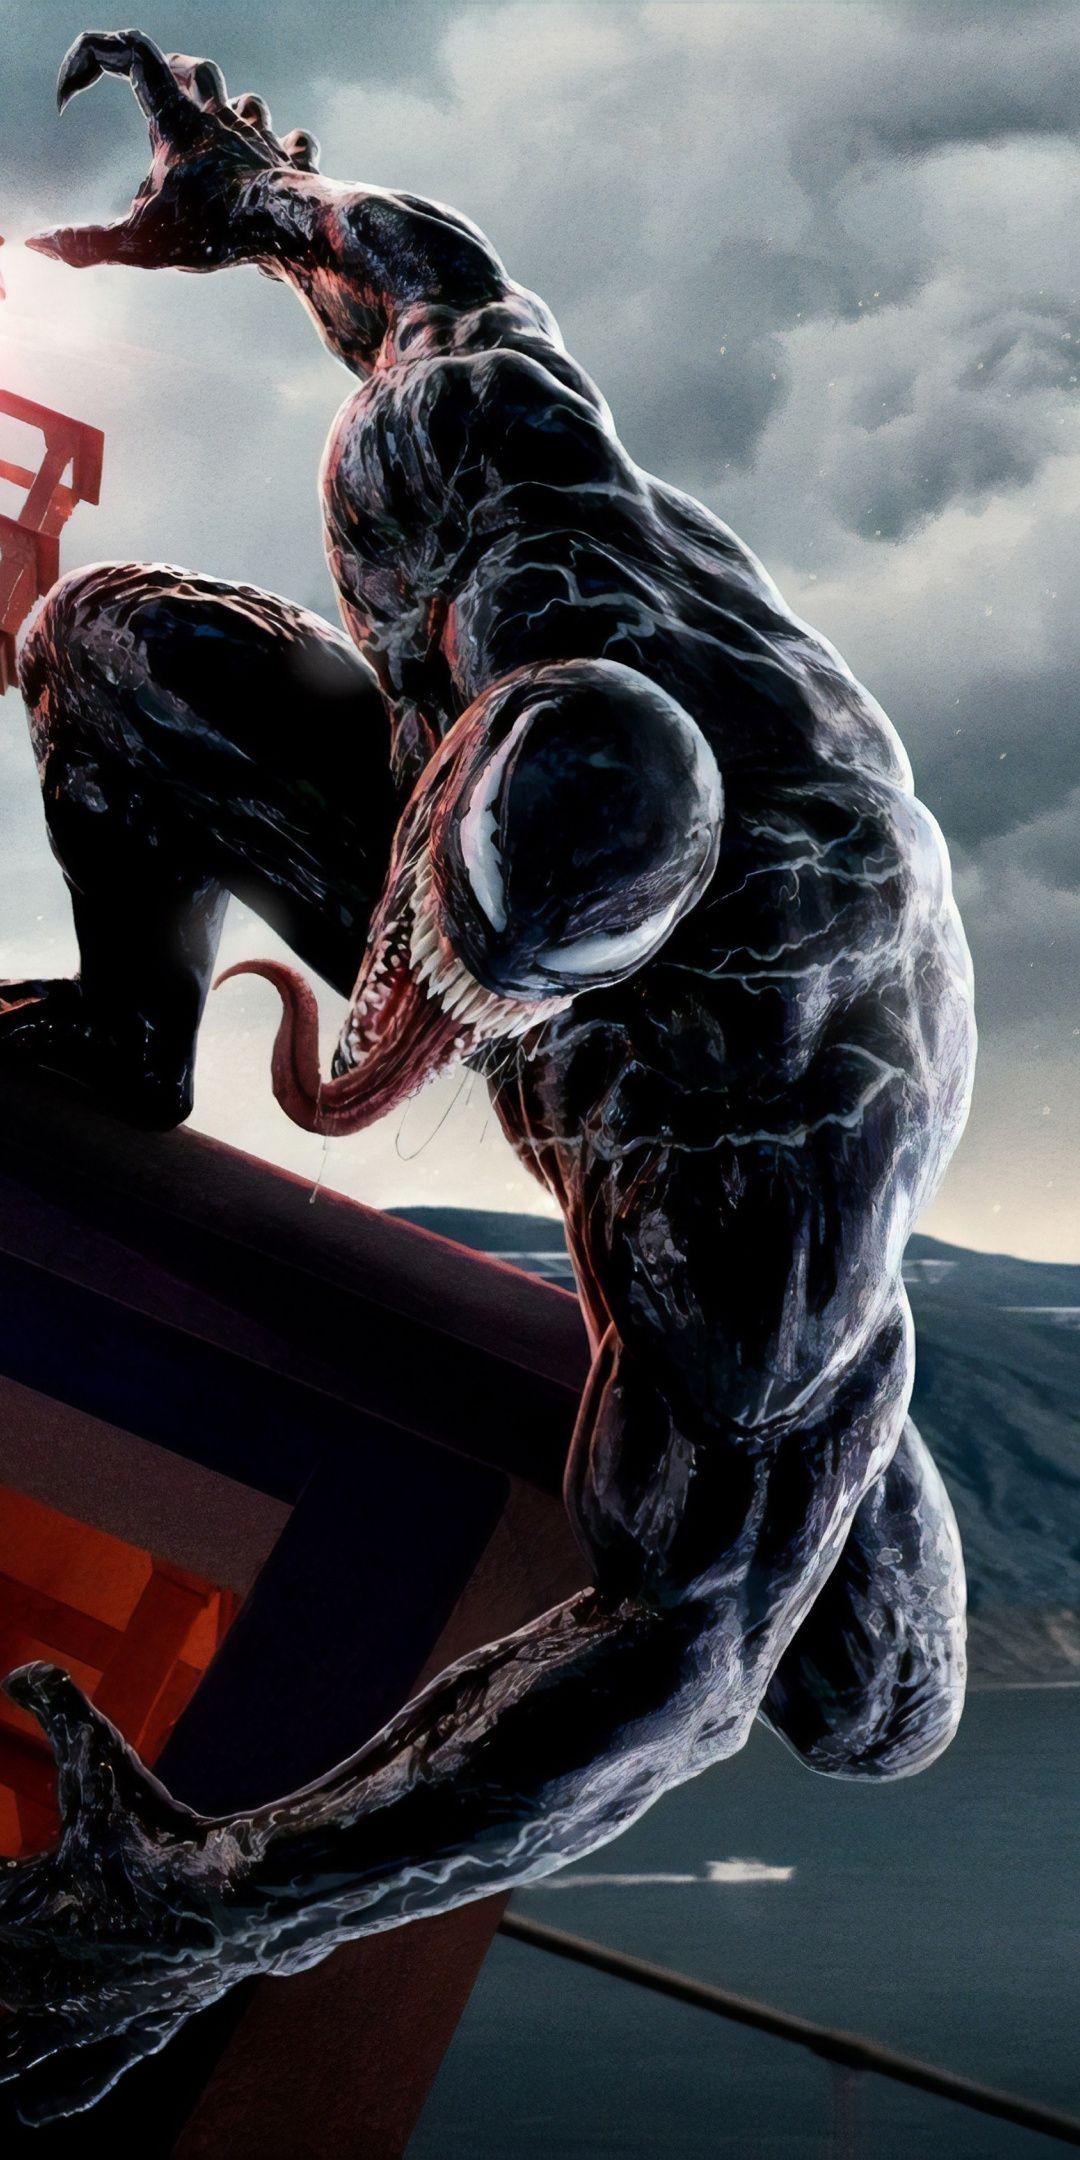 Venom Super Villain Art 2018 1080x2160 Wallpaper Marvel Wallpaper Hd Venom Comics Marvel Venom